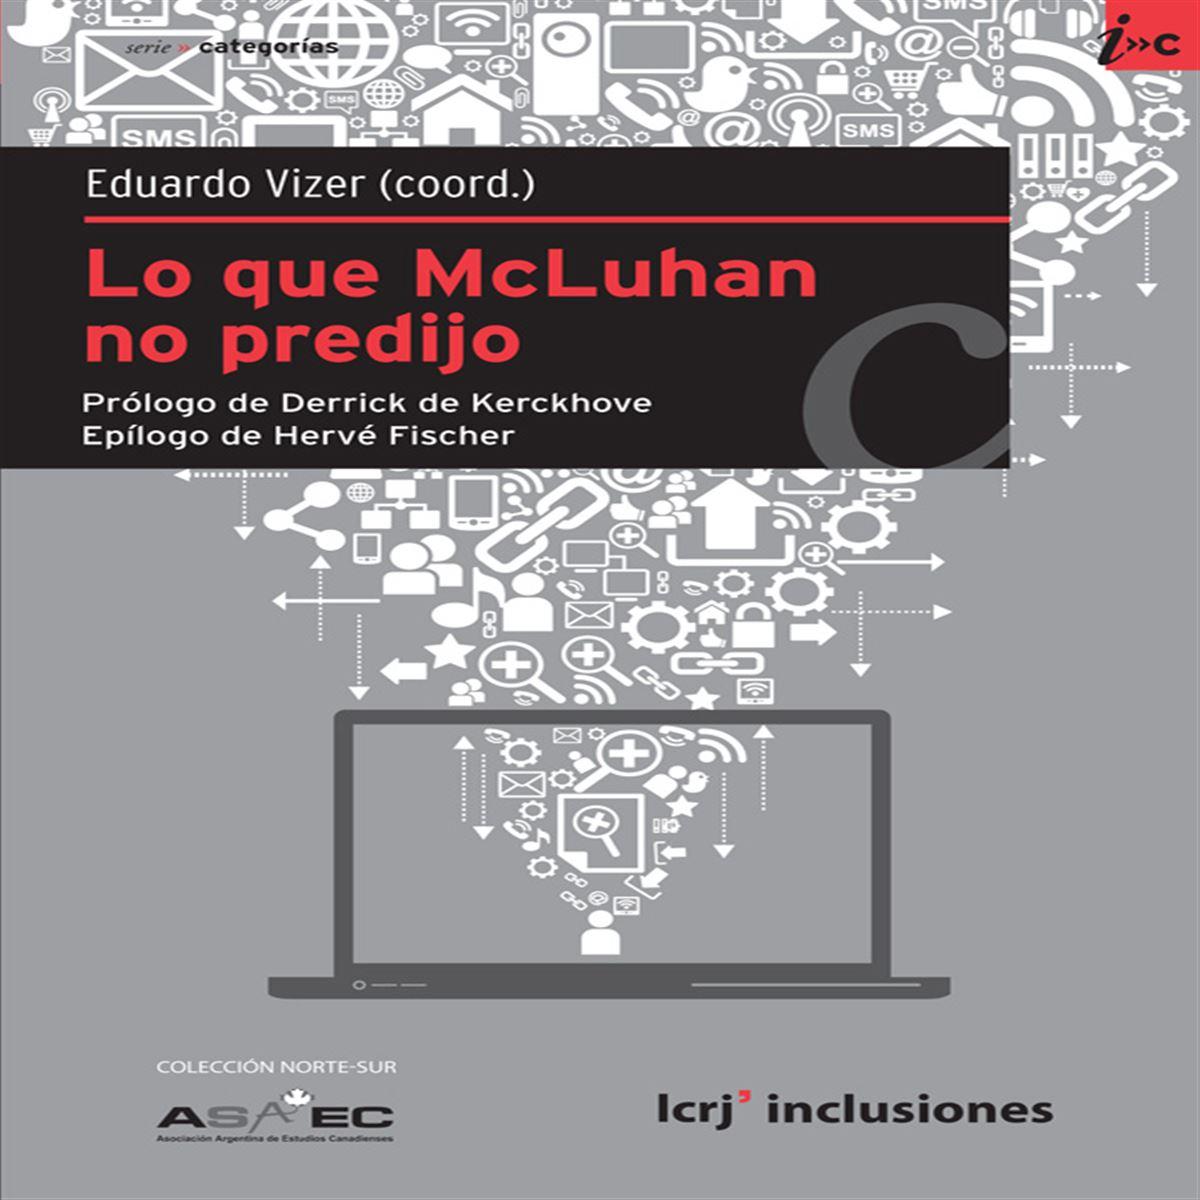 Lo que McLuhan no predijo